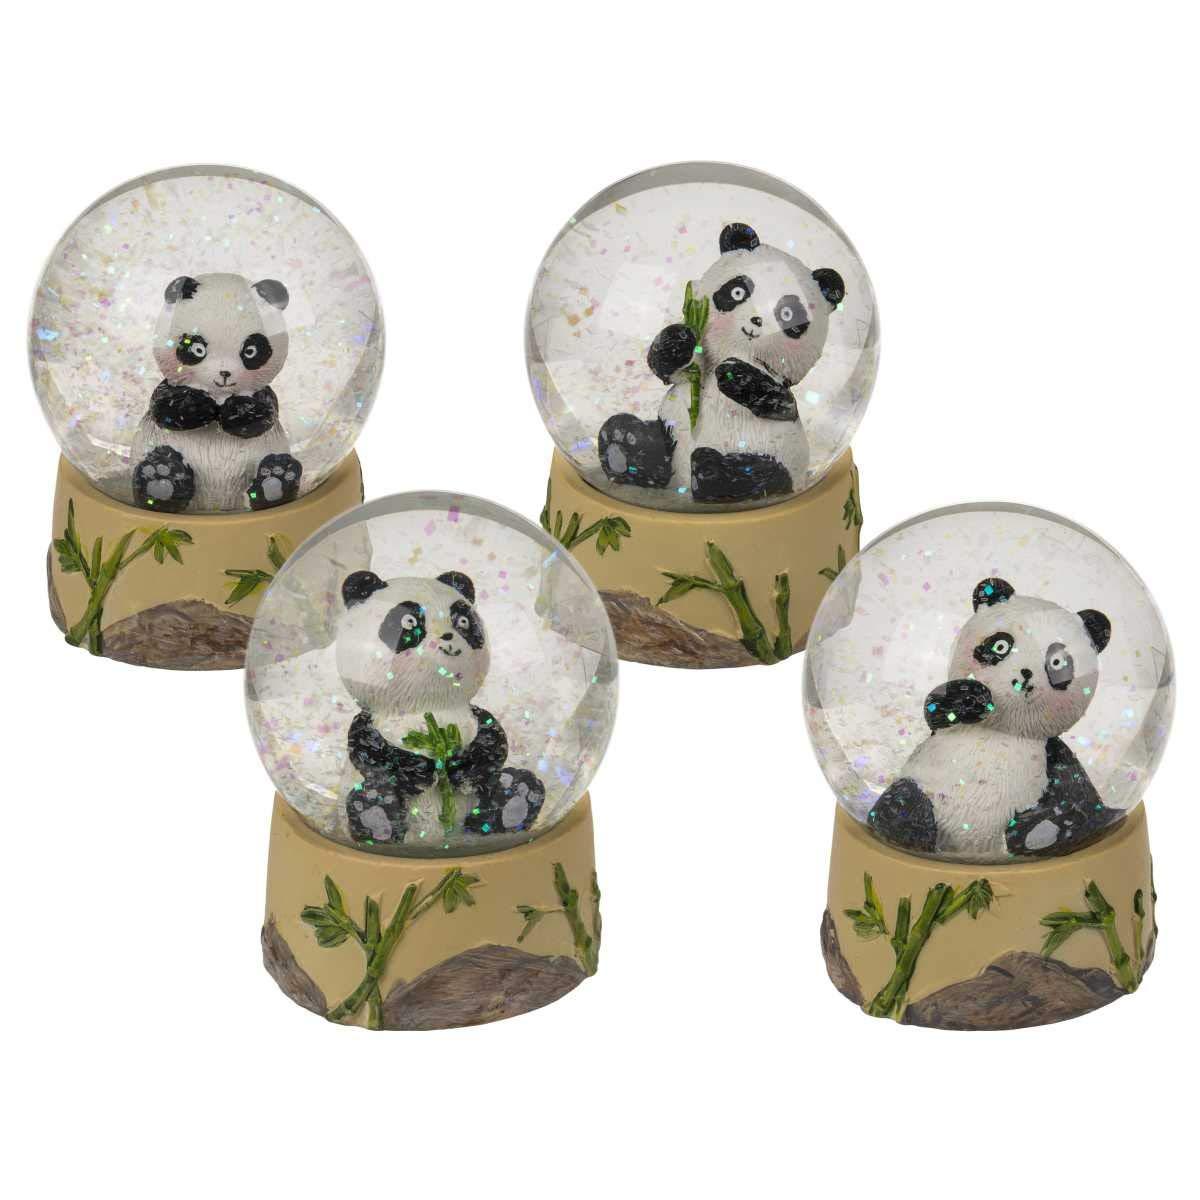 Out of the blue Baby Sitting Panda Glitter Globo De Nieve